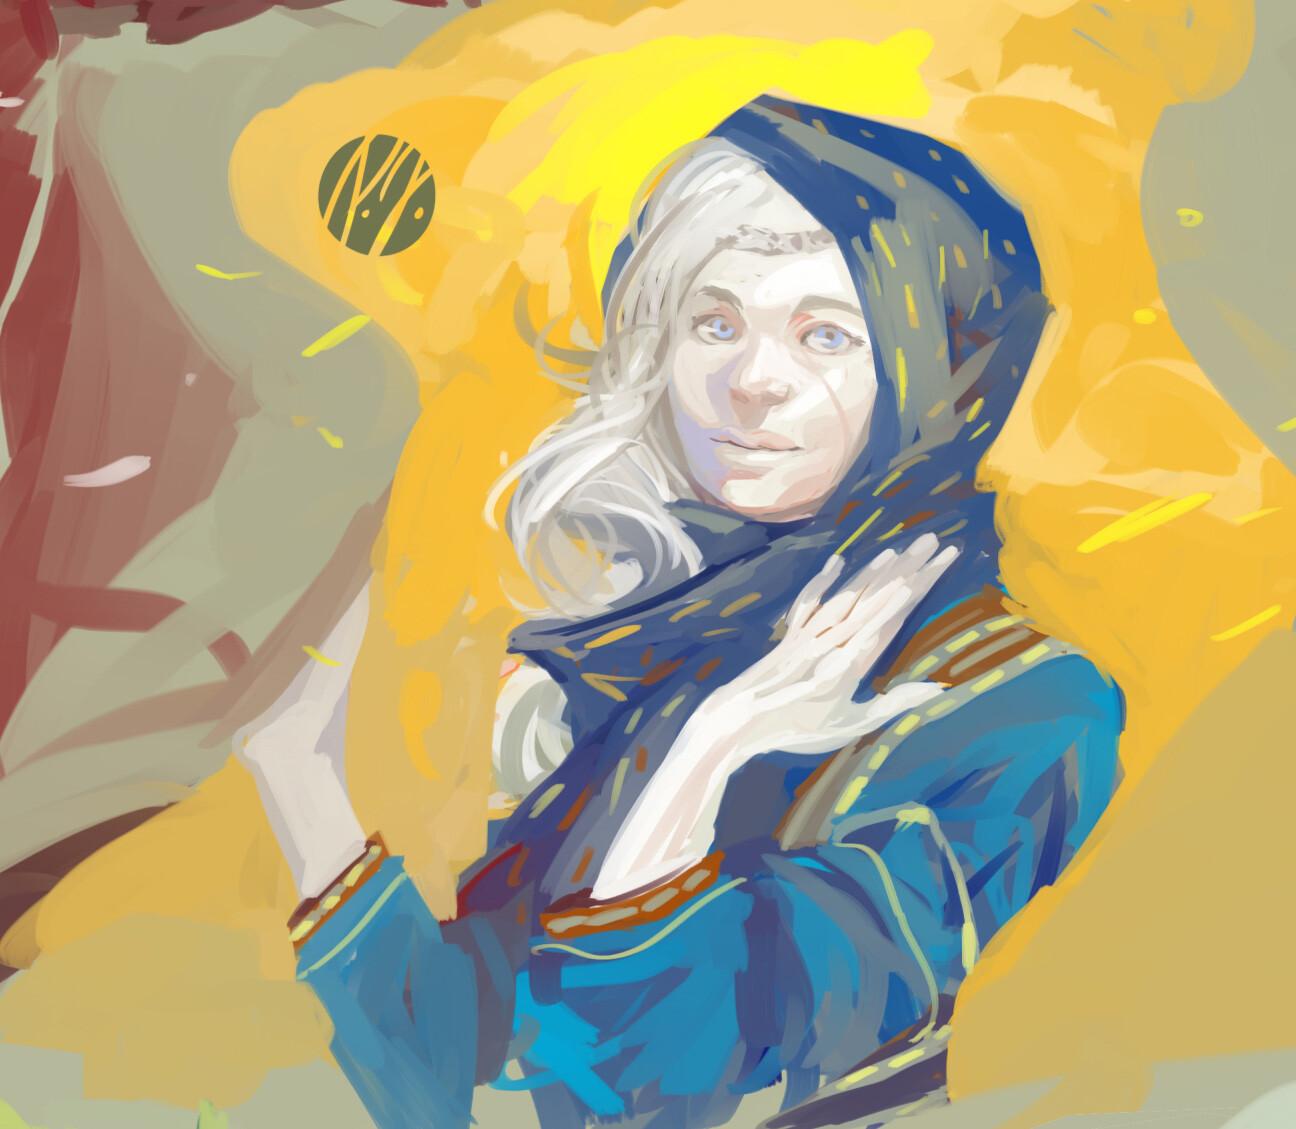 Characters idea - mayaminamoto.tumblr.com